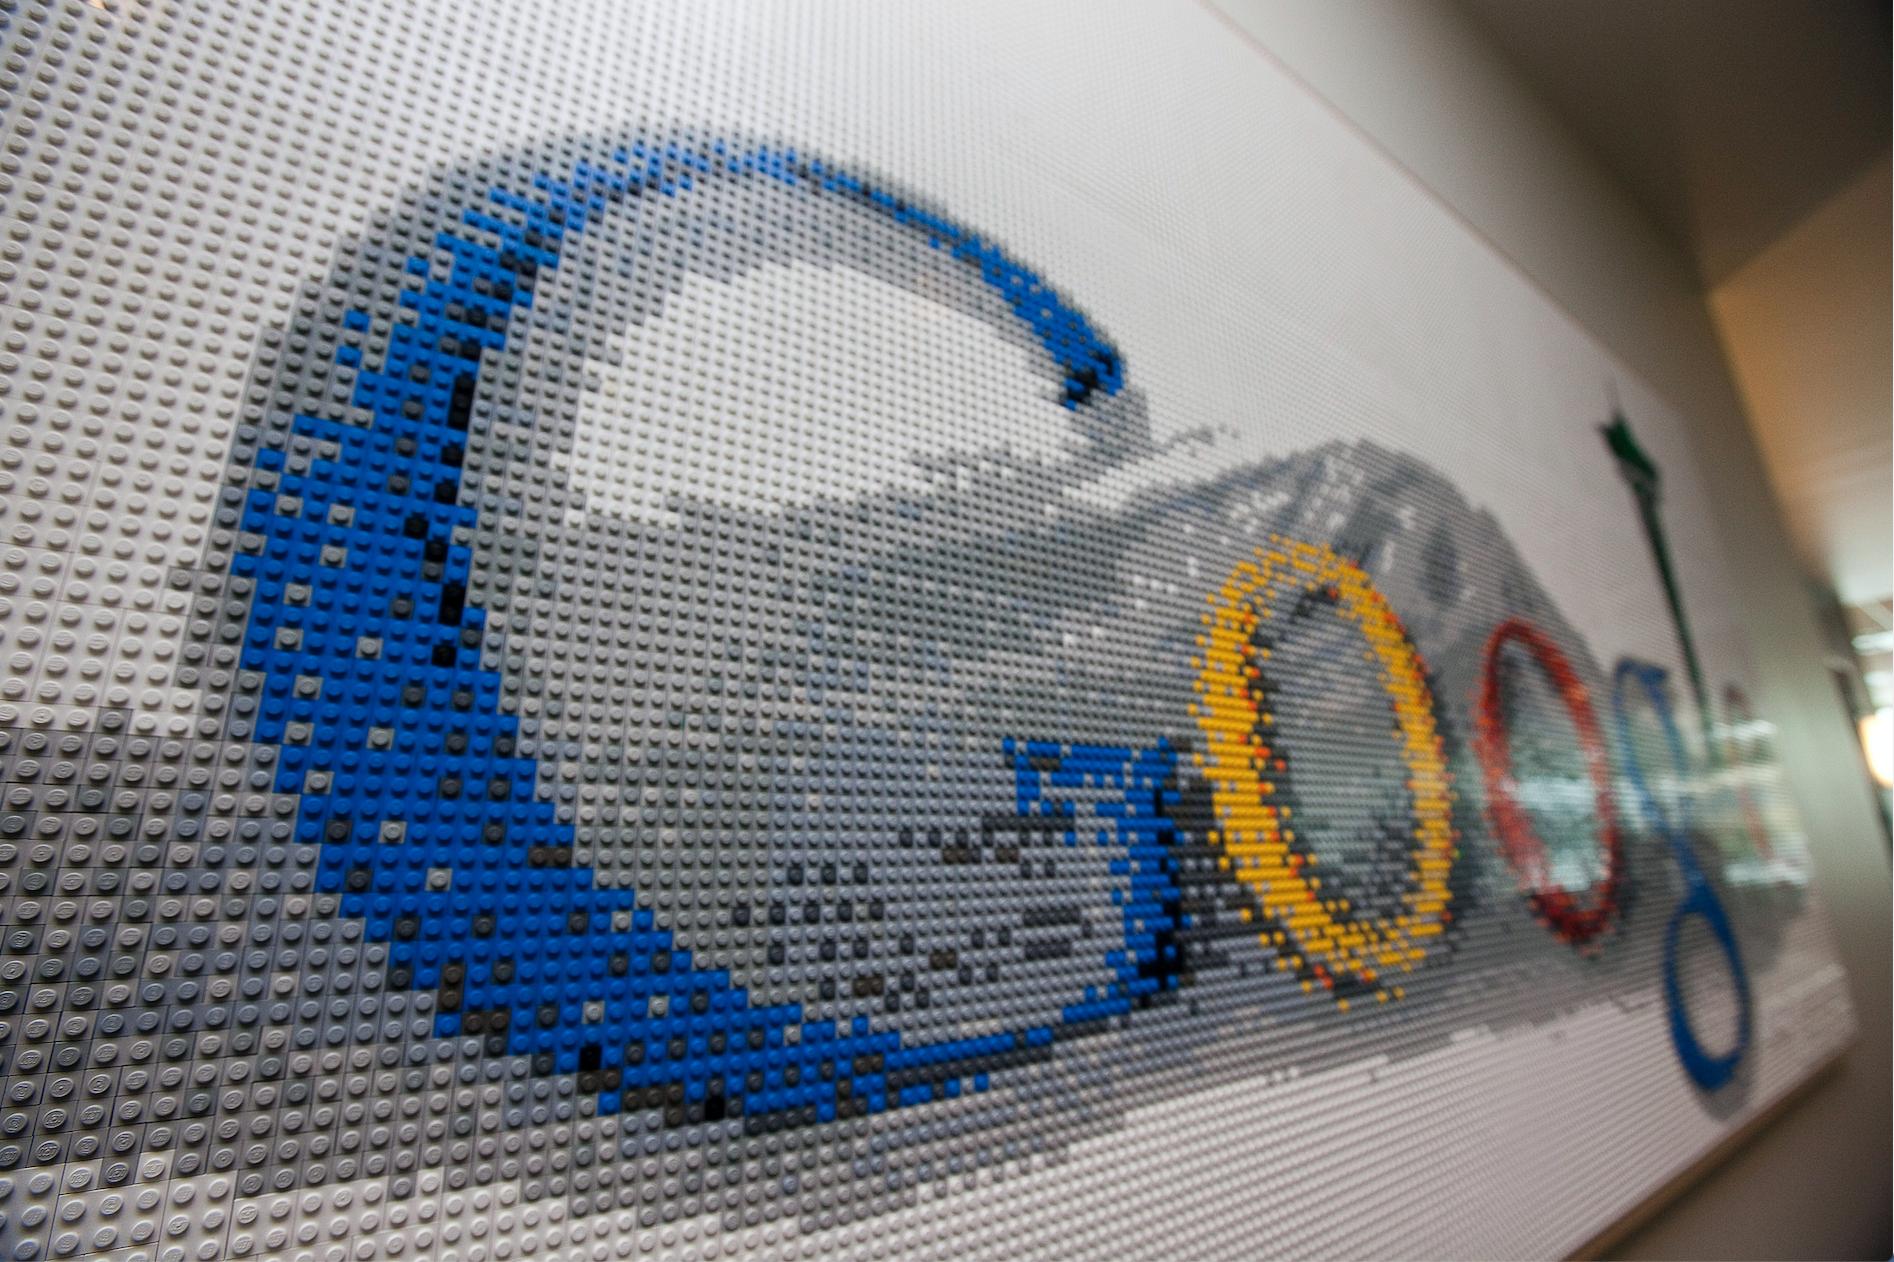 Google Stephen Brashear/Getty Images